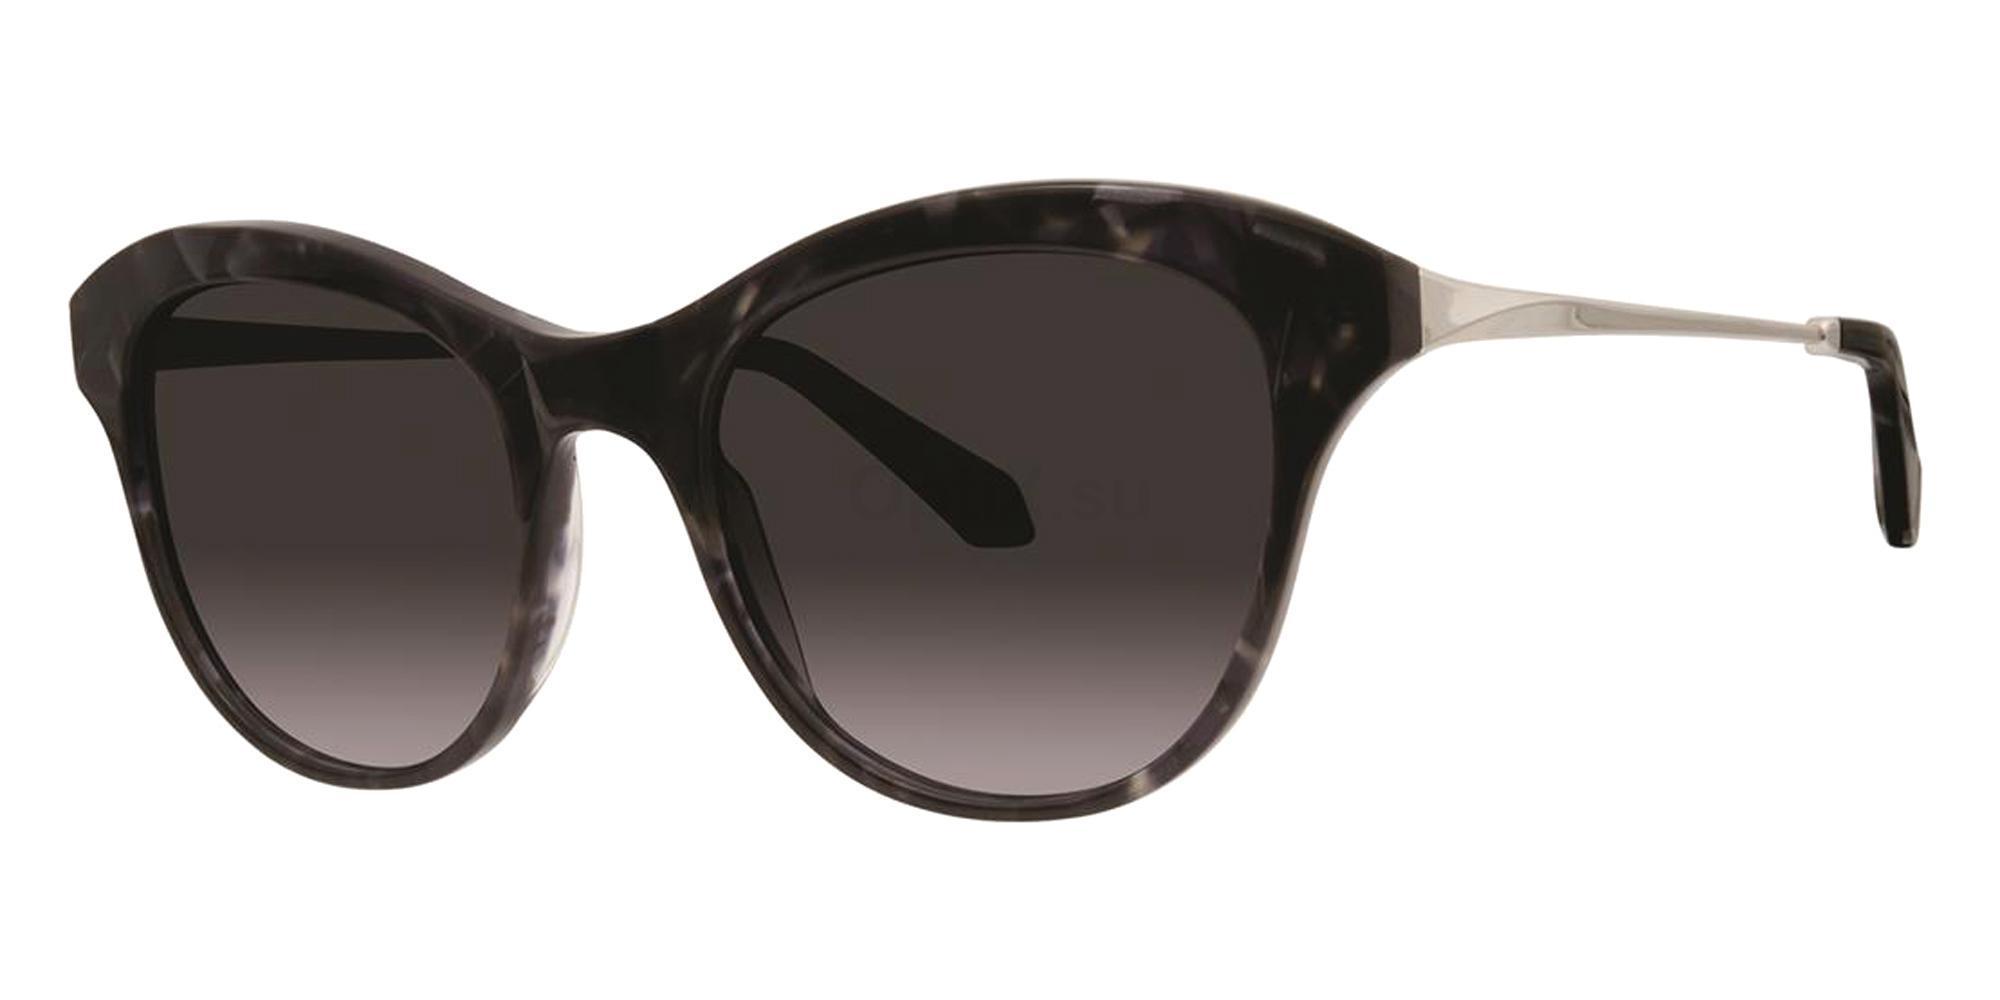 Black Satin JOLENE Sunglasses, Zac Posen